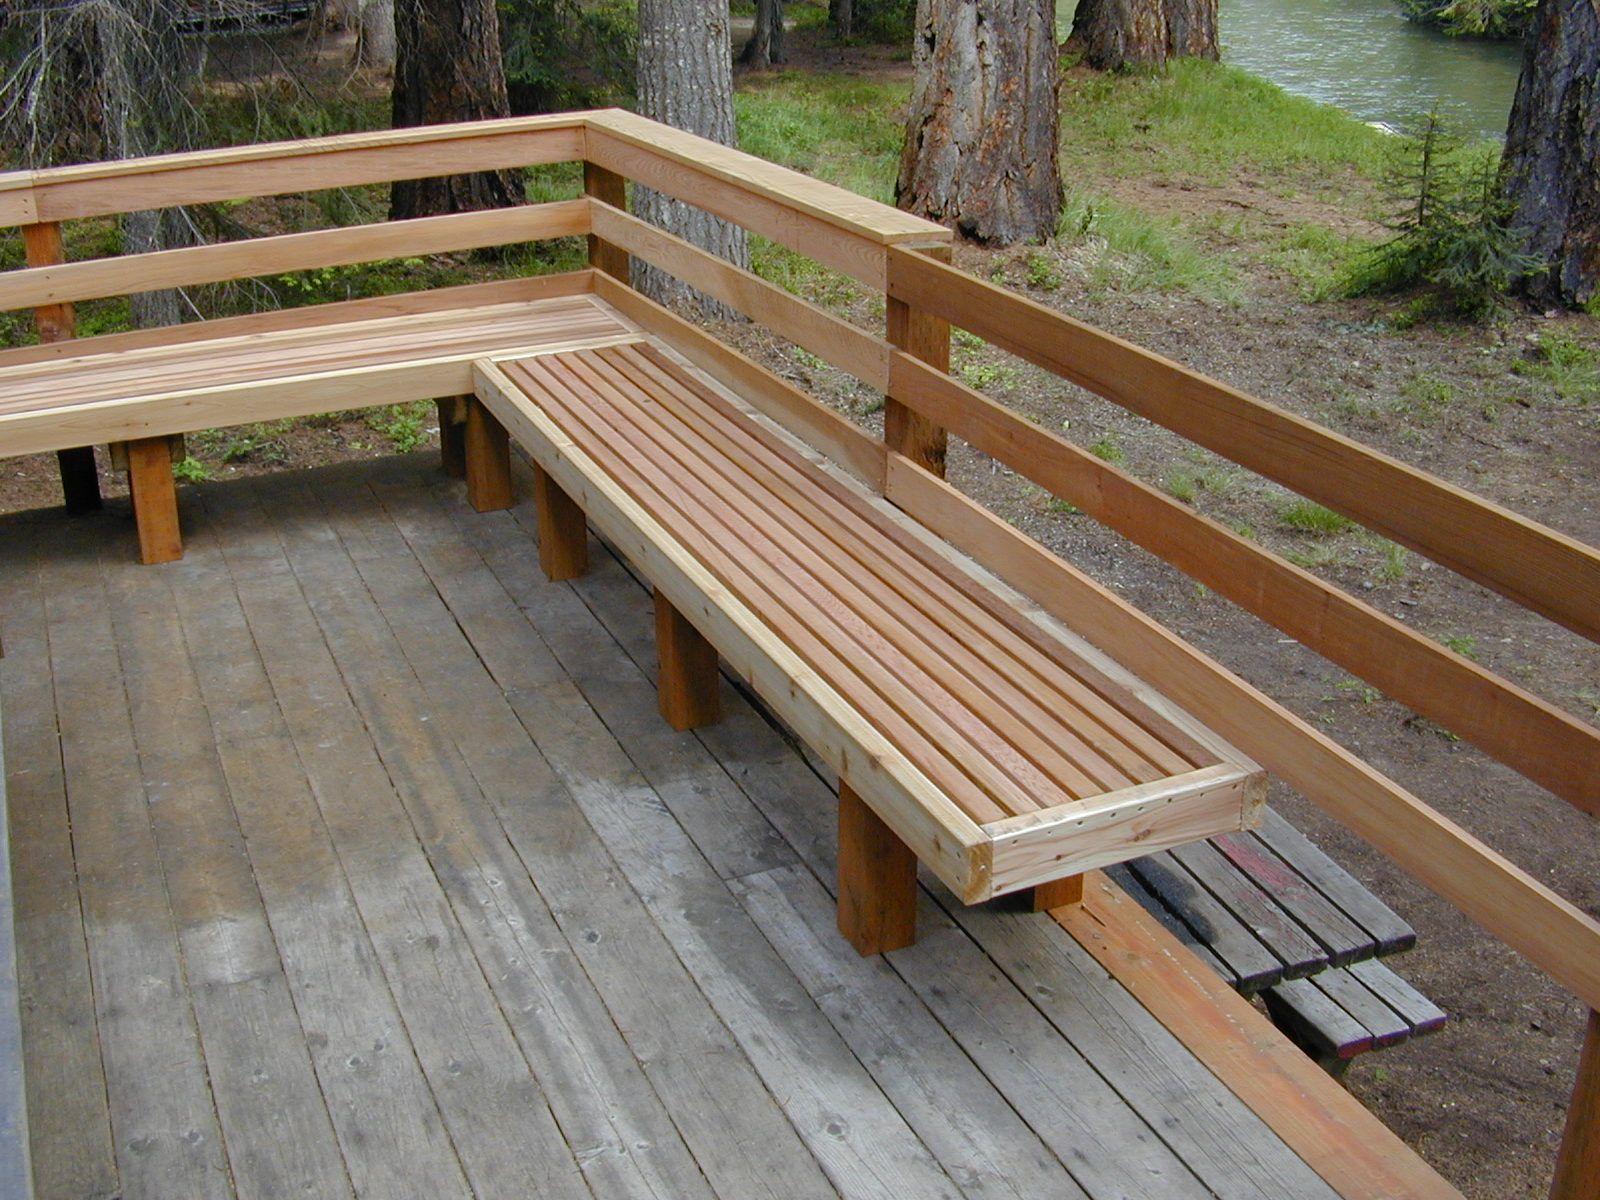 Deck Bench Railing Visit More Deck Railing Ideas Http://awoodrailing.com/ Part 44